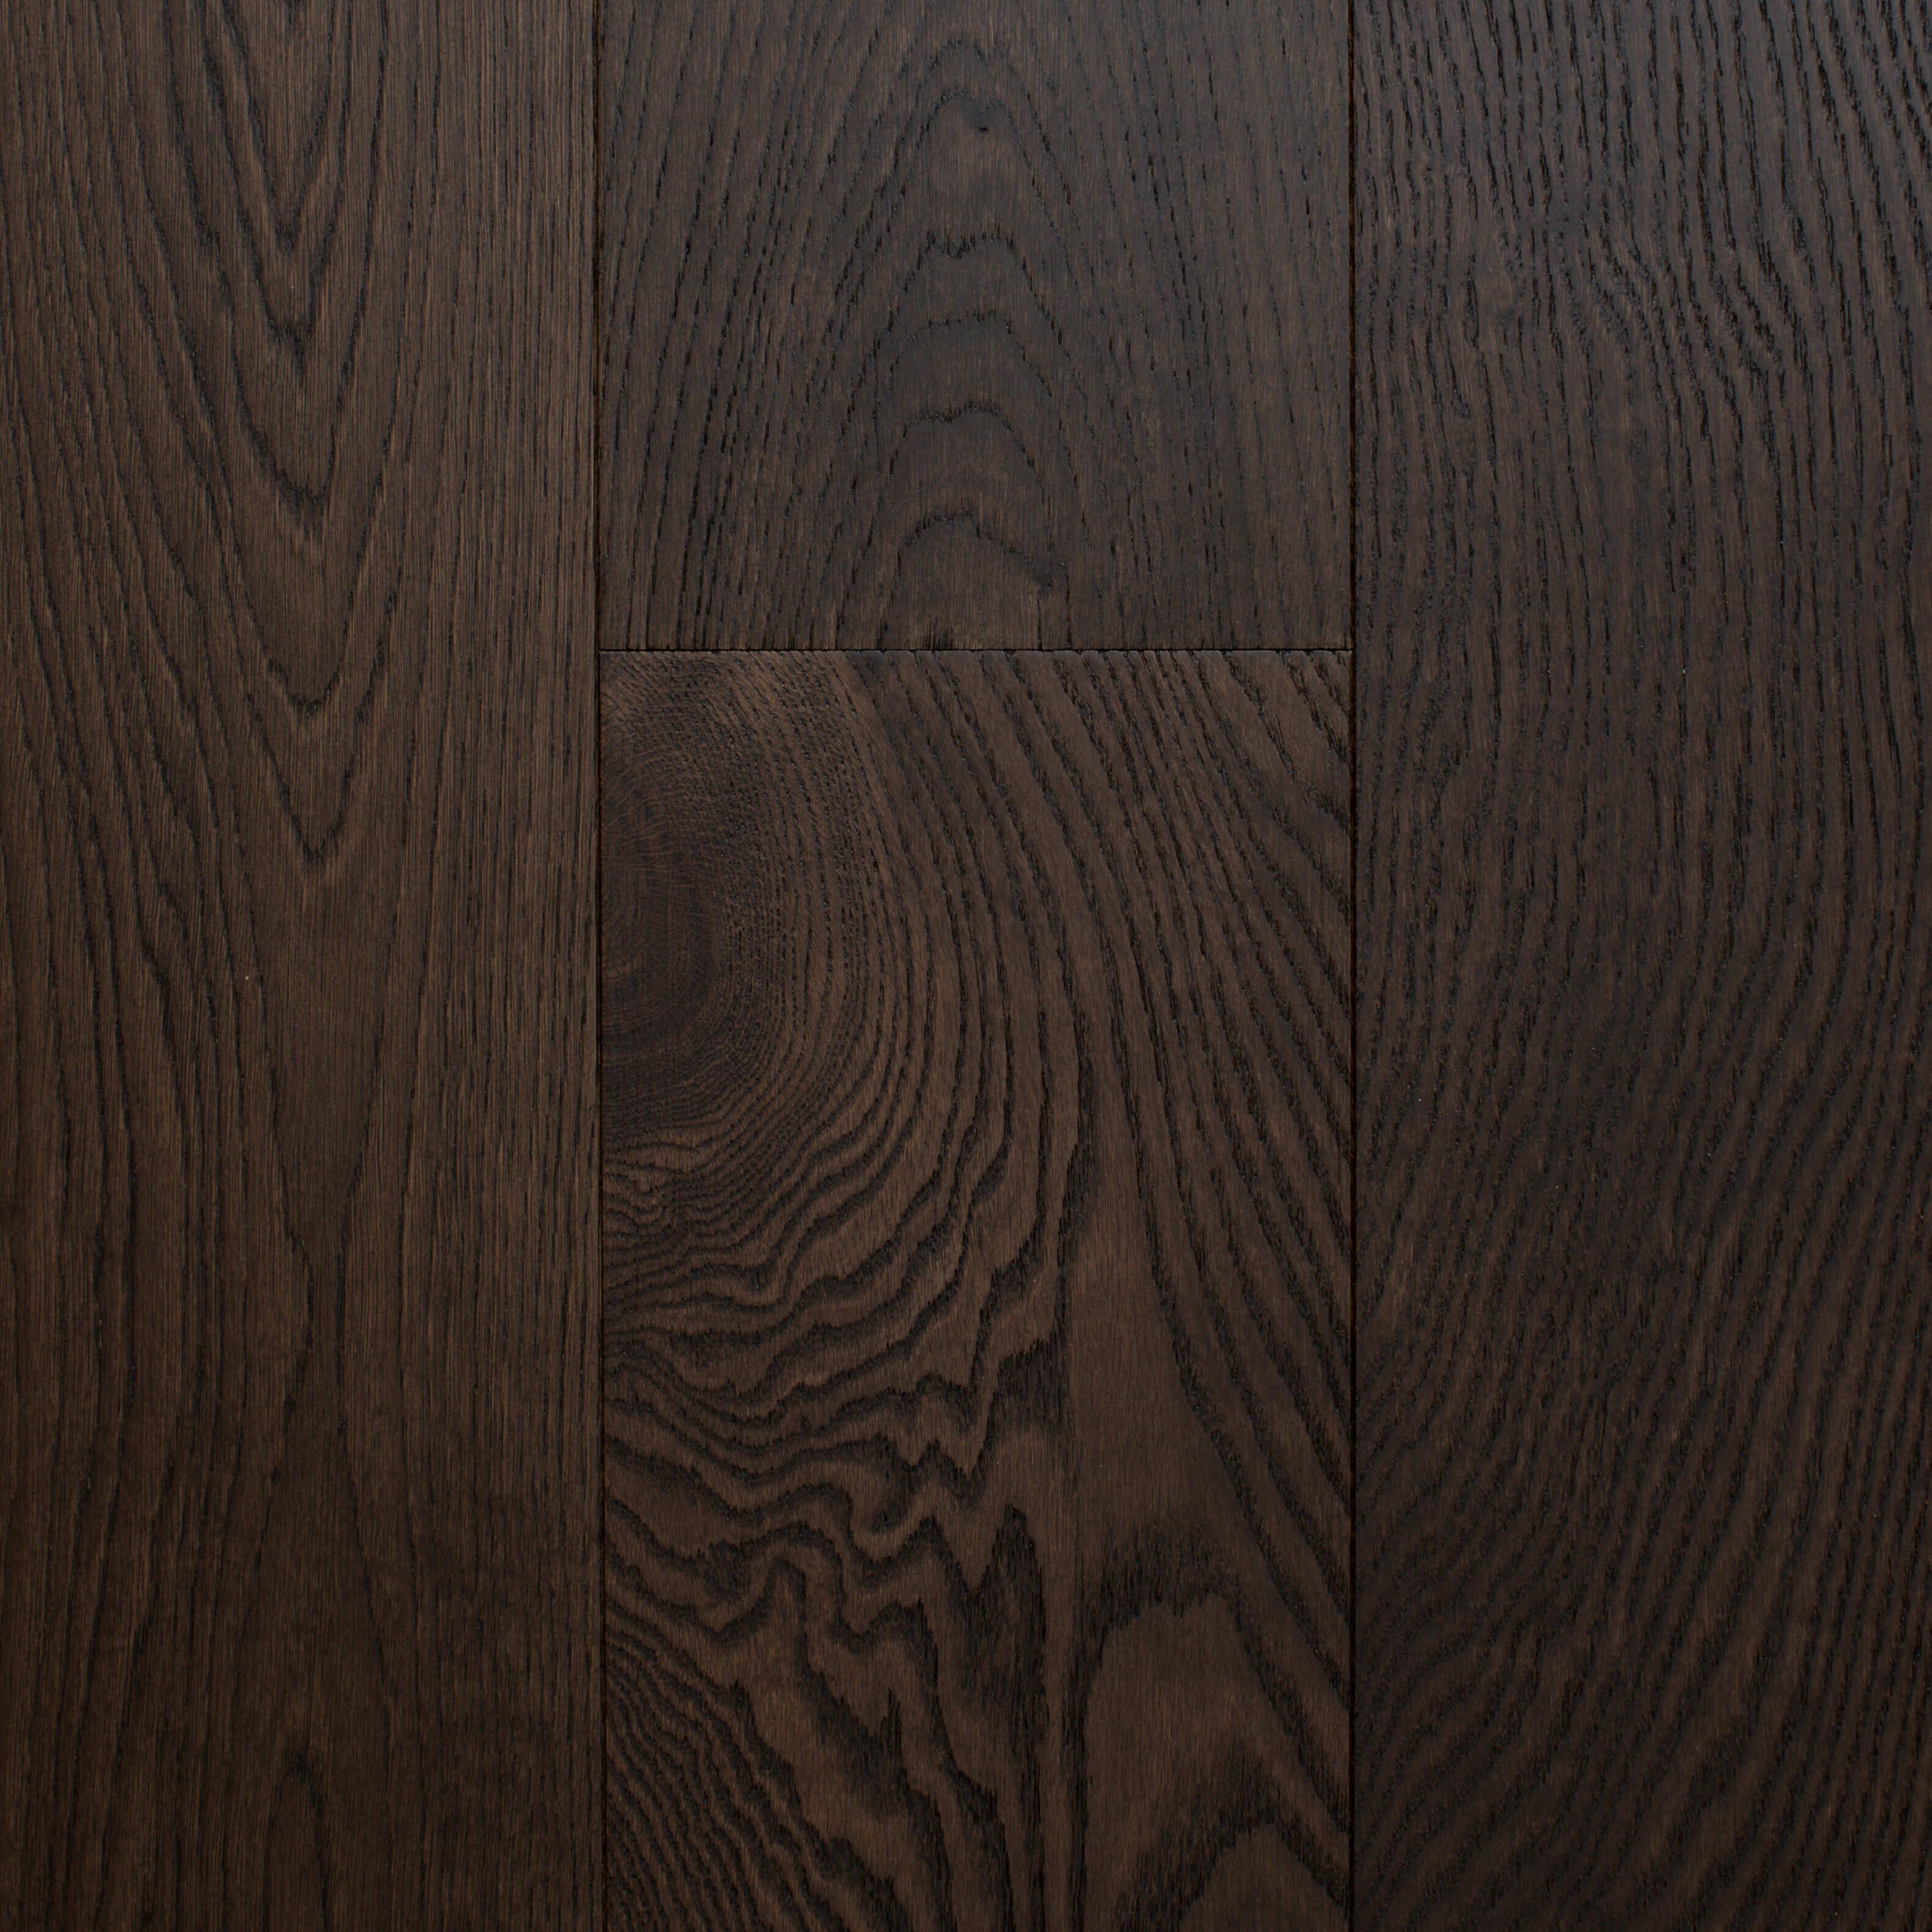 Signature Oak Brushed Cocoa Trevors Carpets